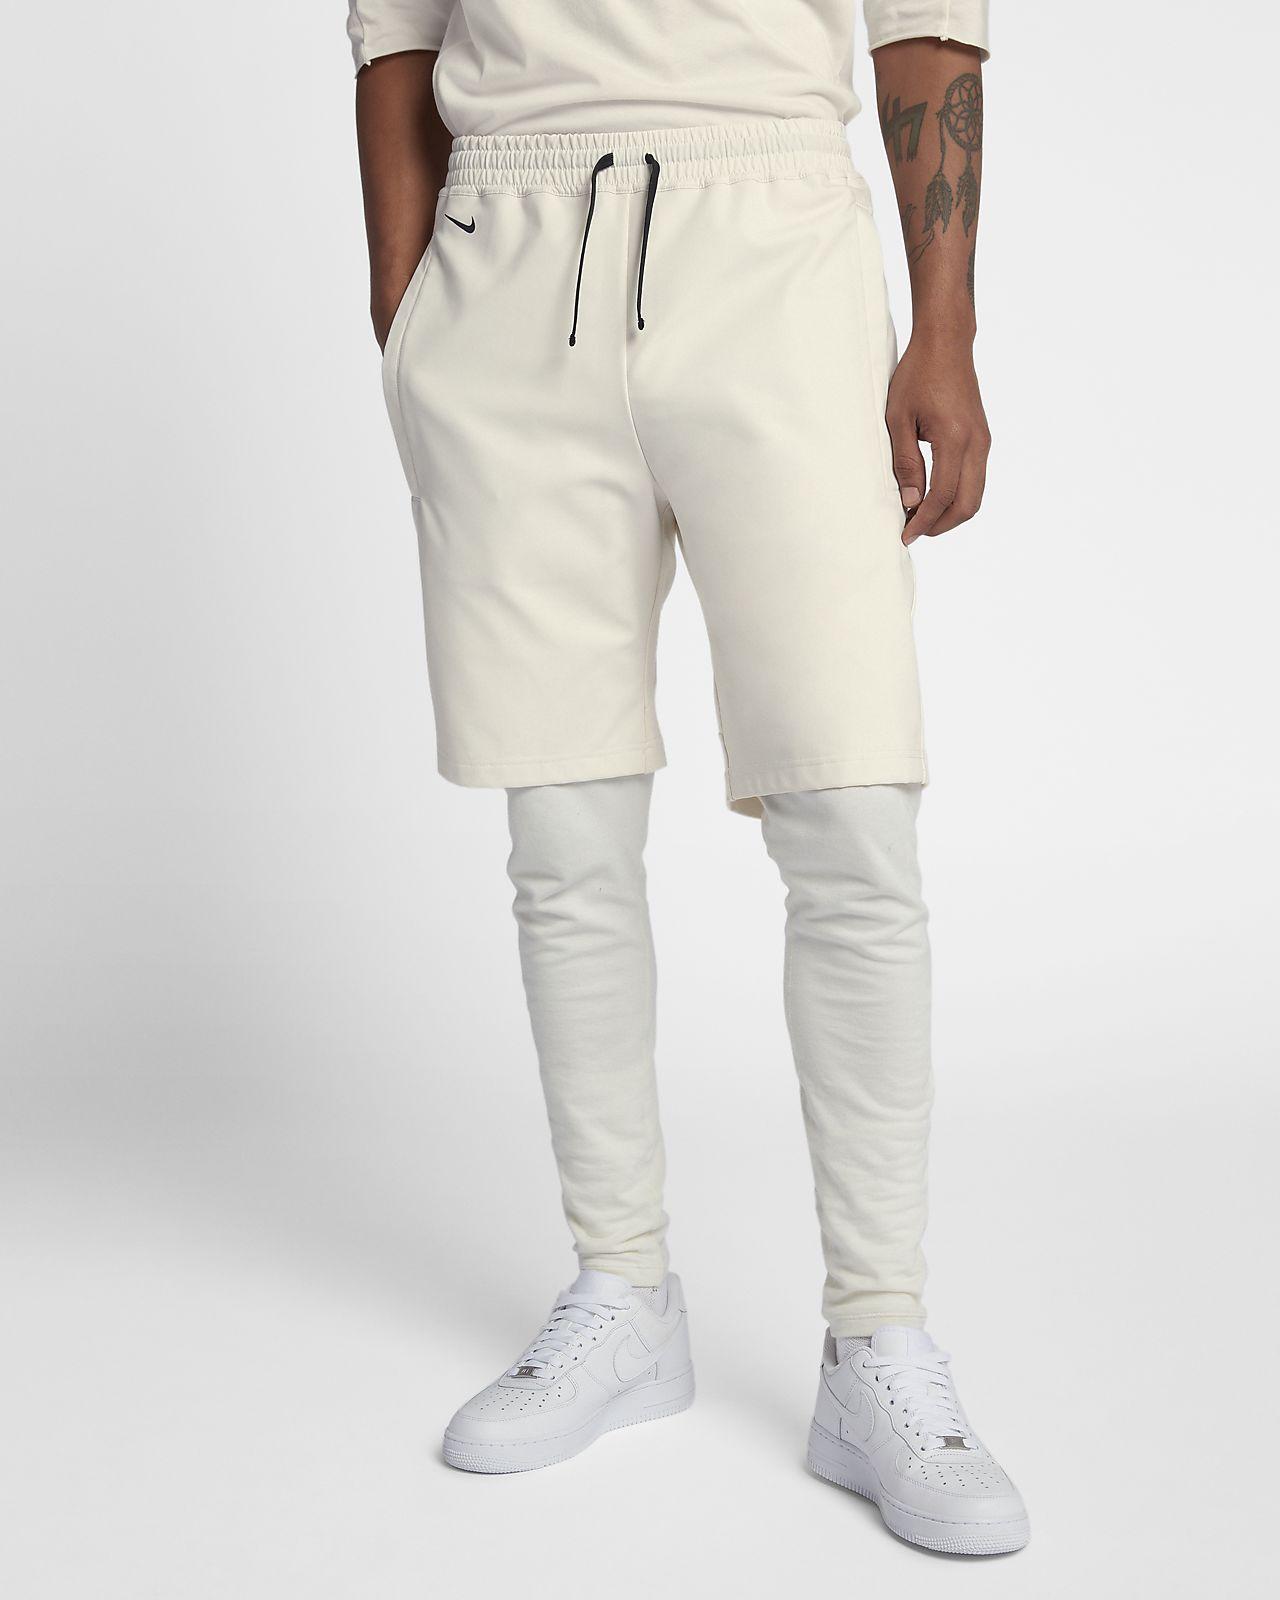 Nike AAE 2.0 shorts til herre